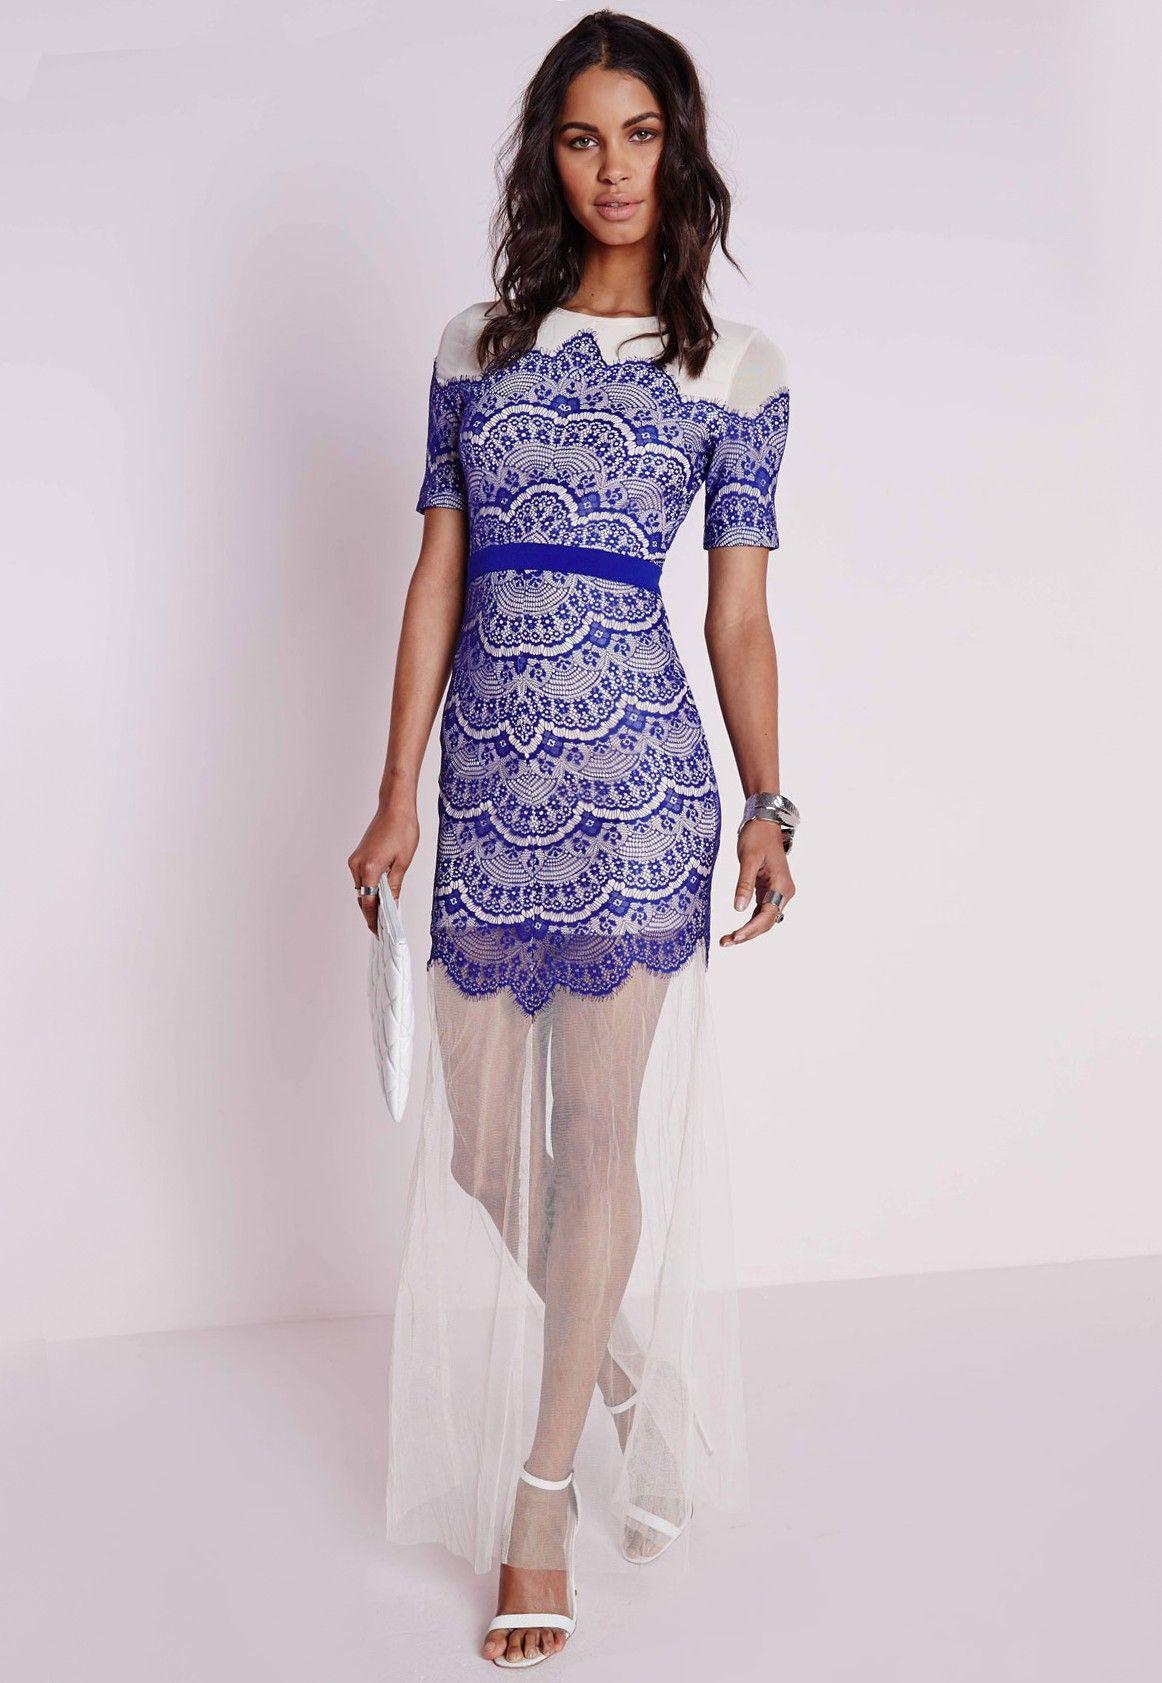 Lace overlay dress maxi